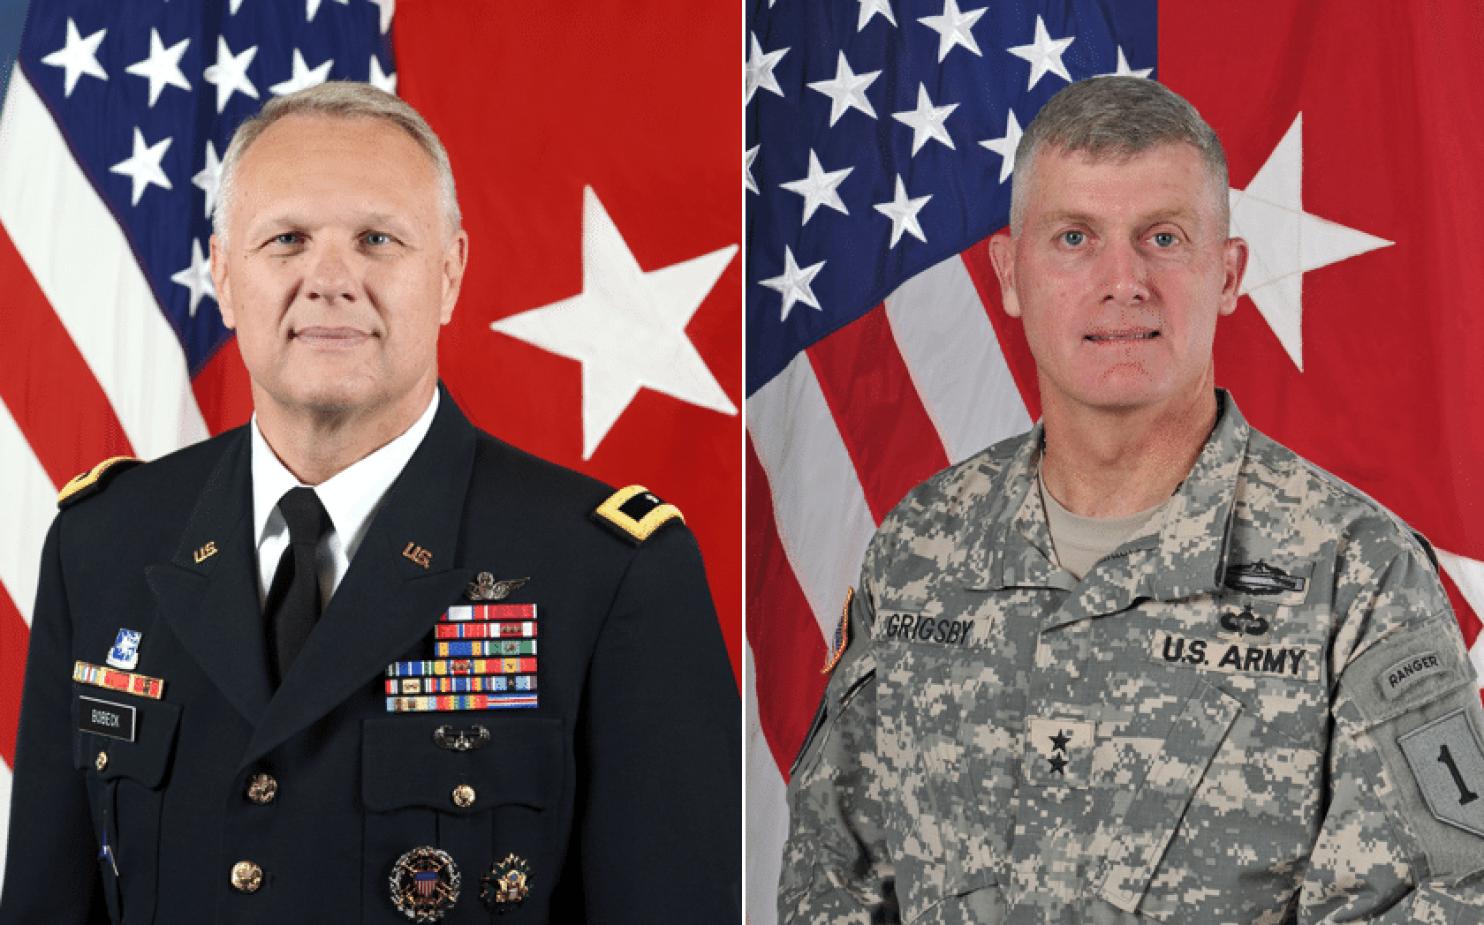 army-general-dick-black-free-rubber-glove-handjob-video